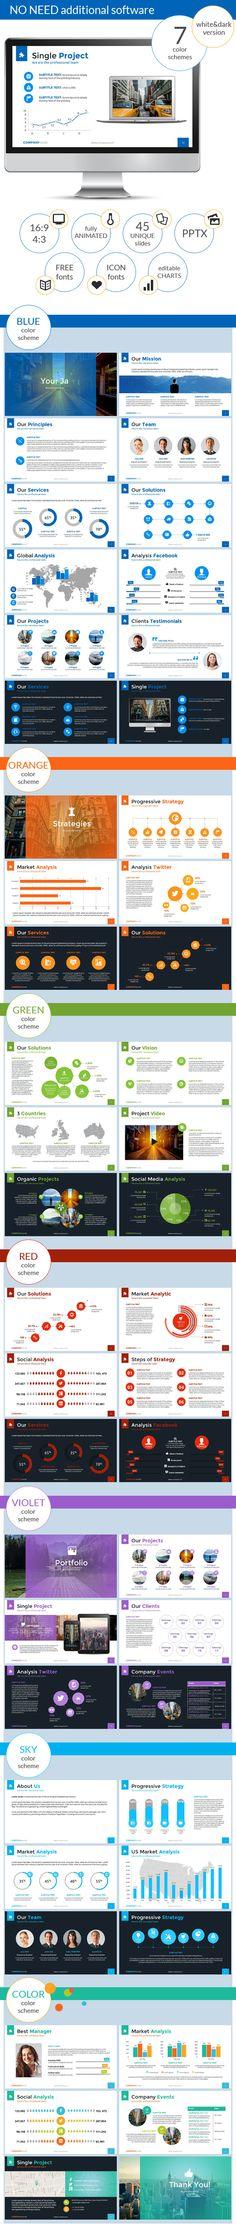 Stylish PowerPoint Presentation Template http://graphicriver.net/item/your-ja-powerpoint-presentation-template/8960216